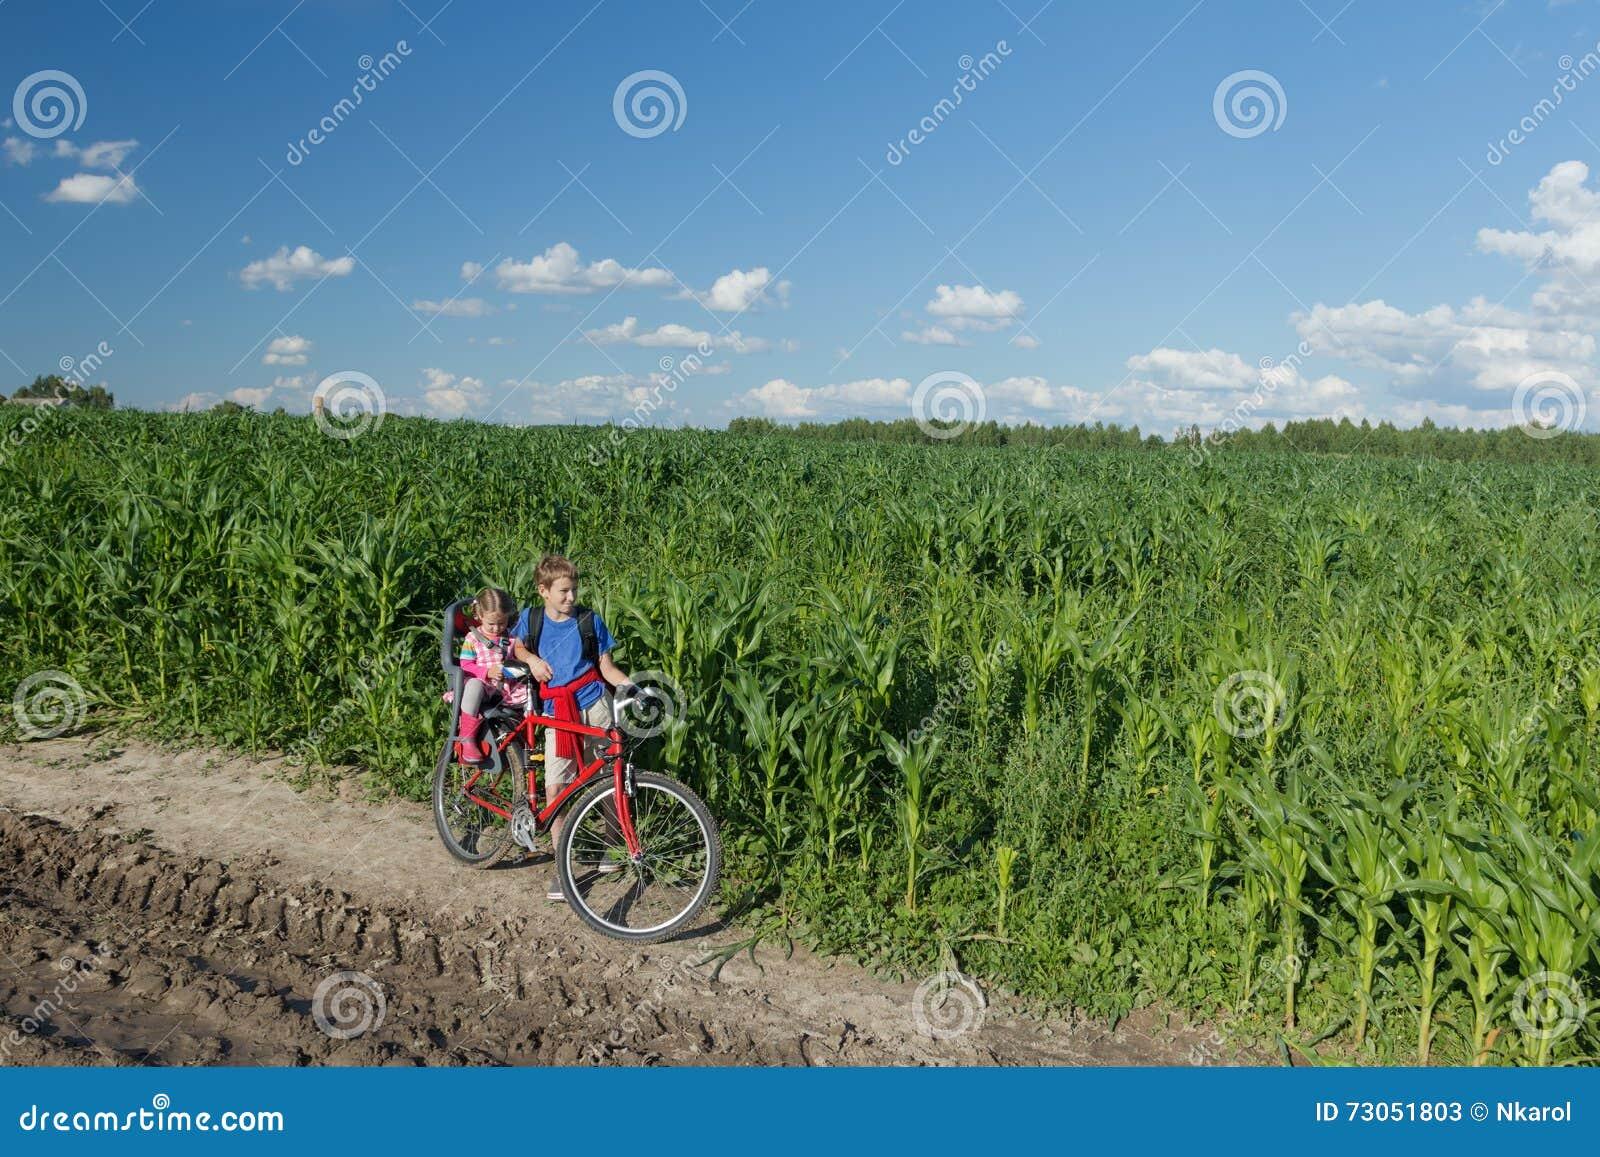 Teenage boy carrying his little sibling sister on baby bike seat on farm corn field summer dirt road